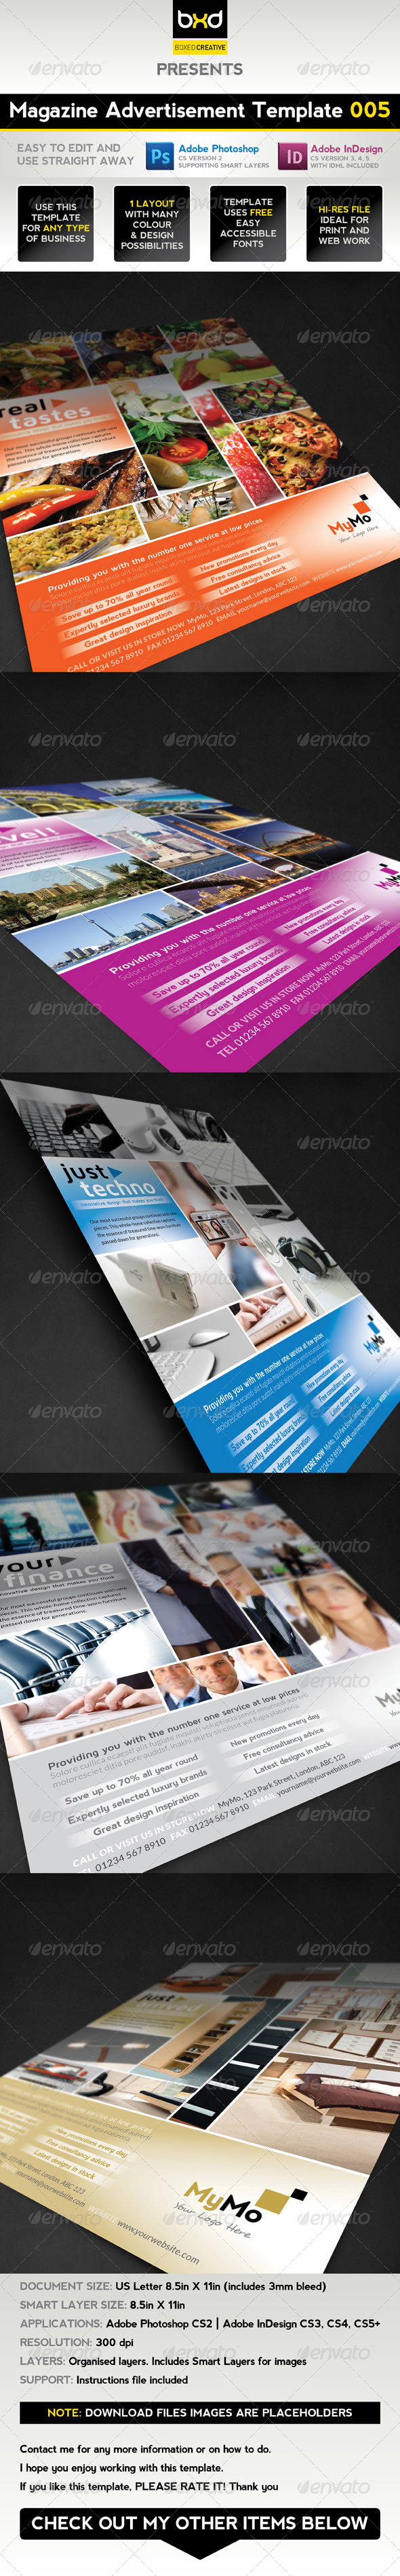 GraphicRiver Magazine Advert Template 005 1608757